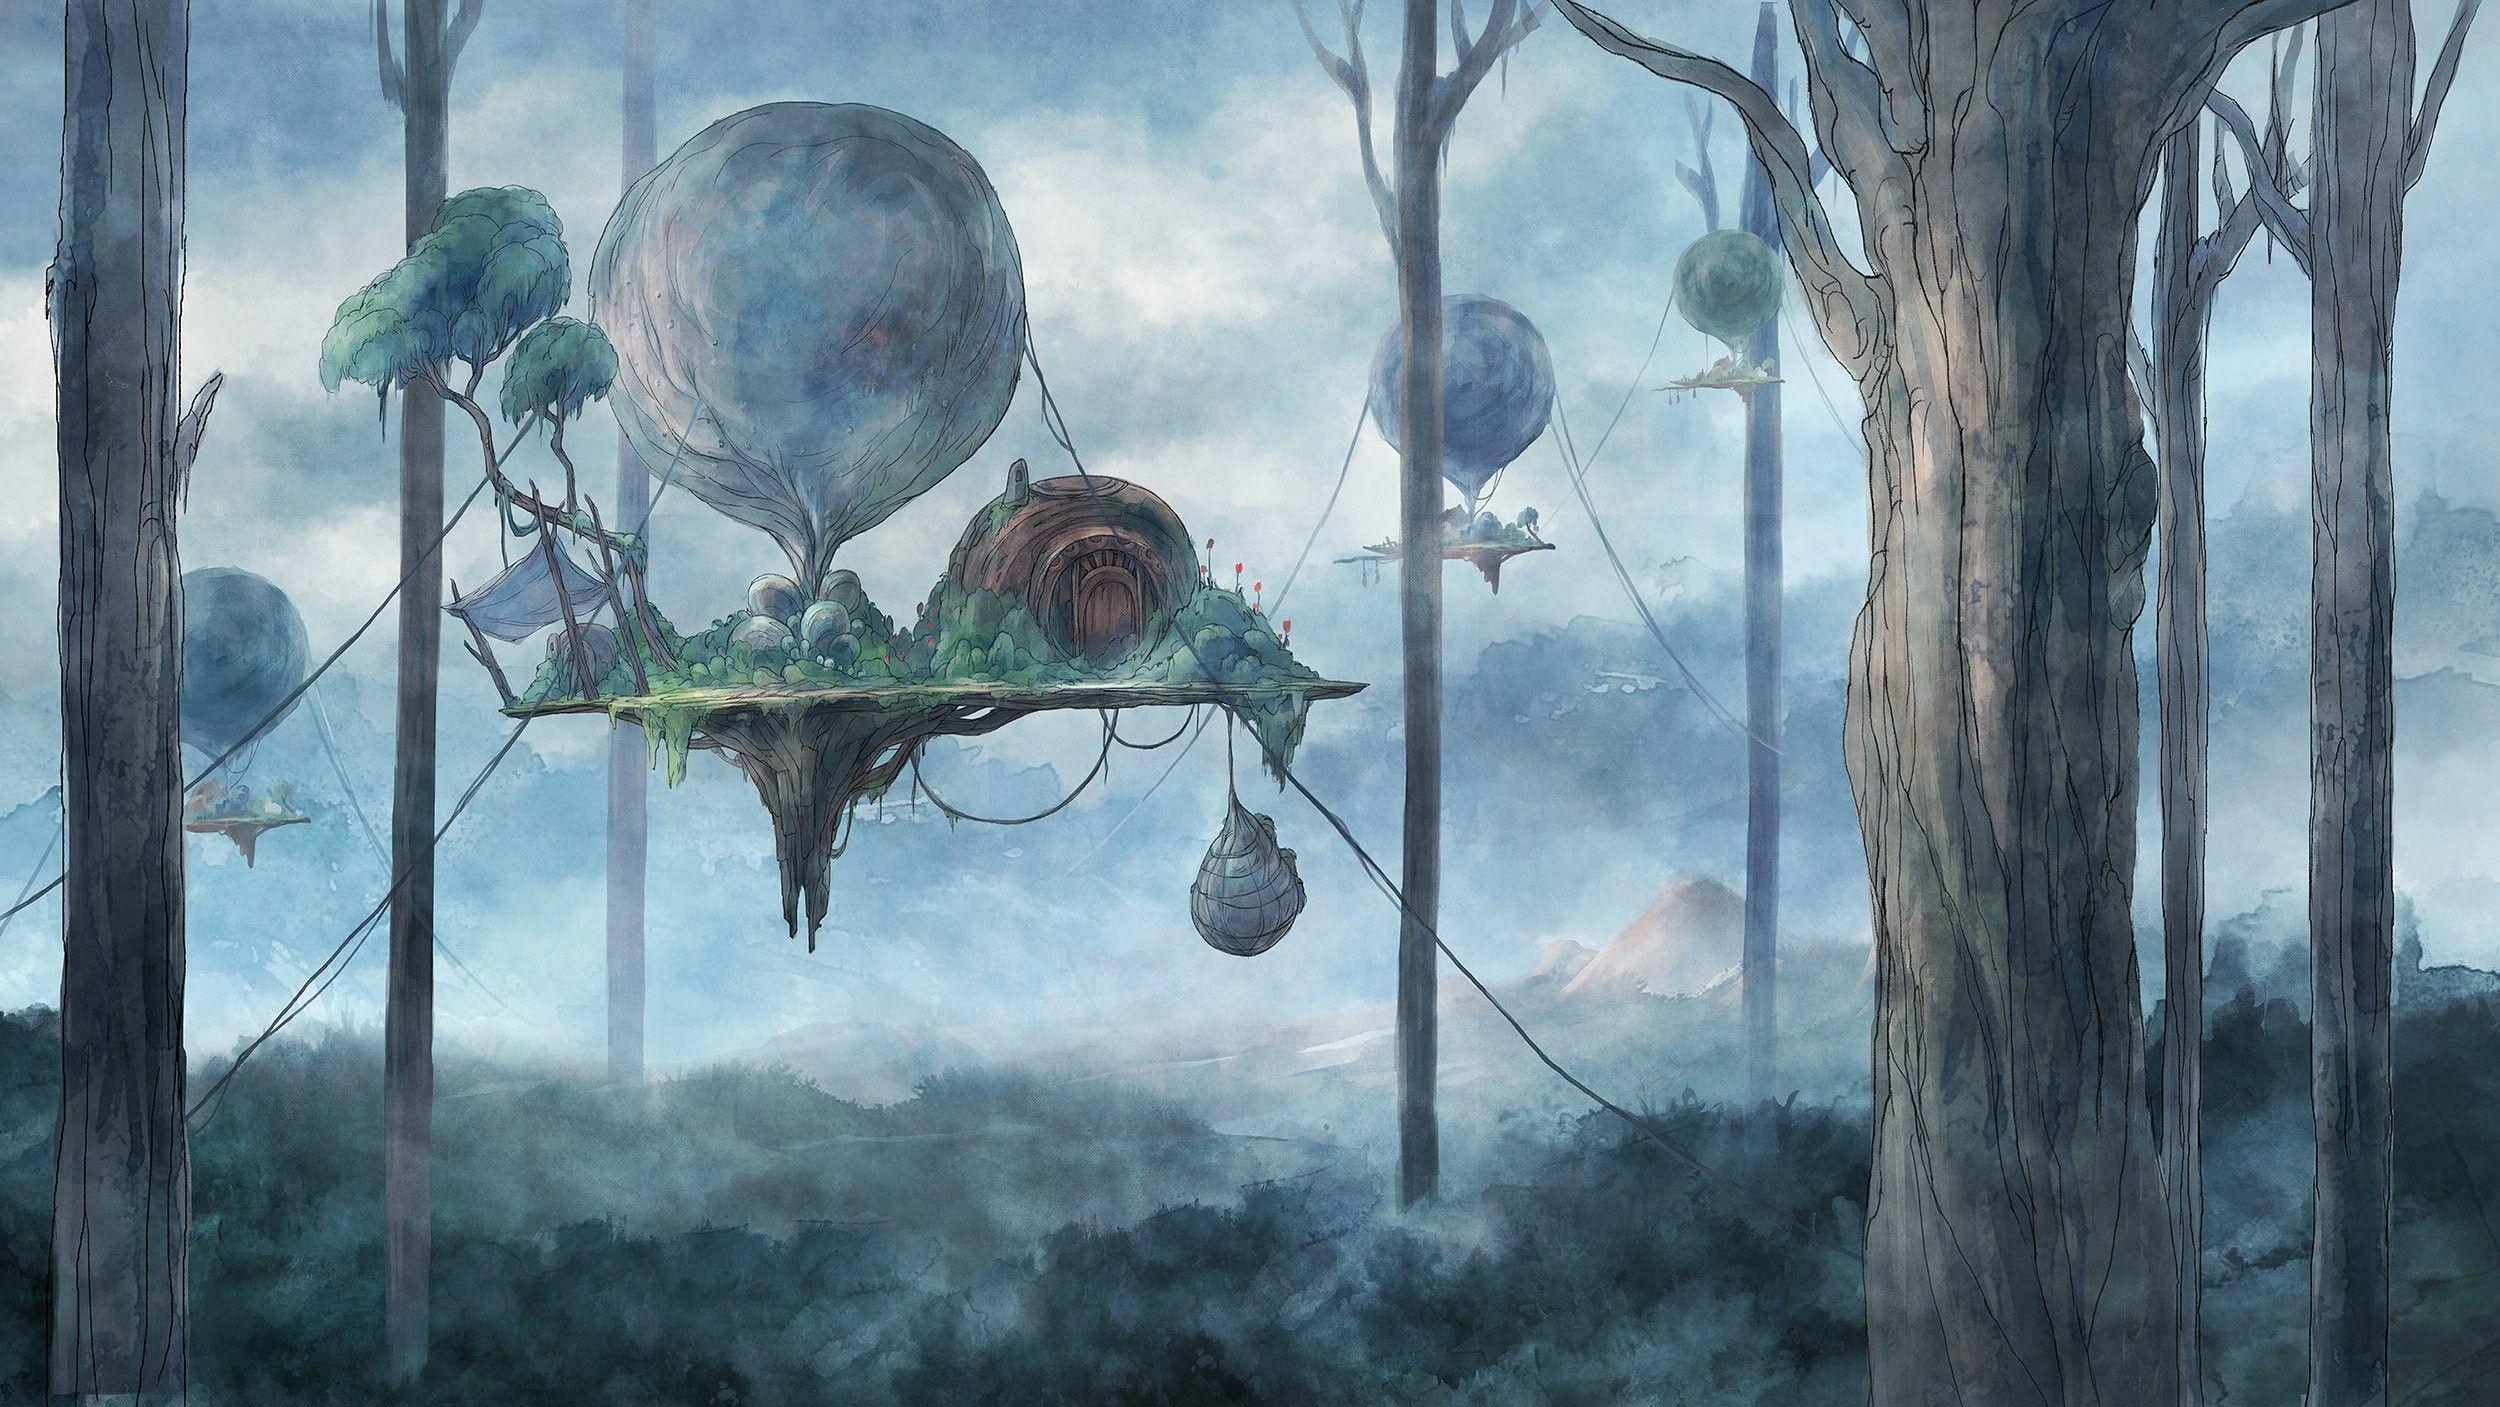 Mobile And Desktop Wallpaper Hd Child Of Light World Of Warcraft Gold Game Concept Art